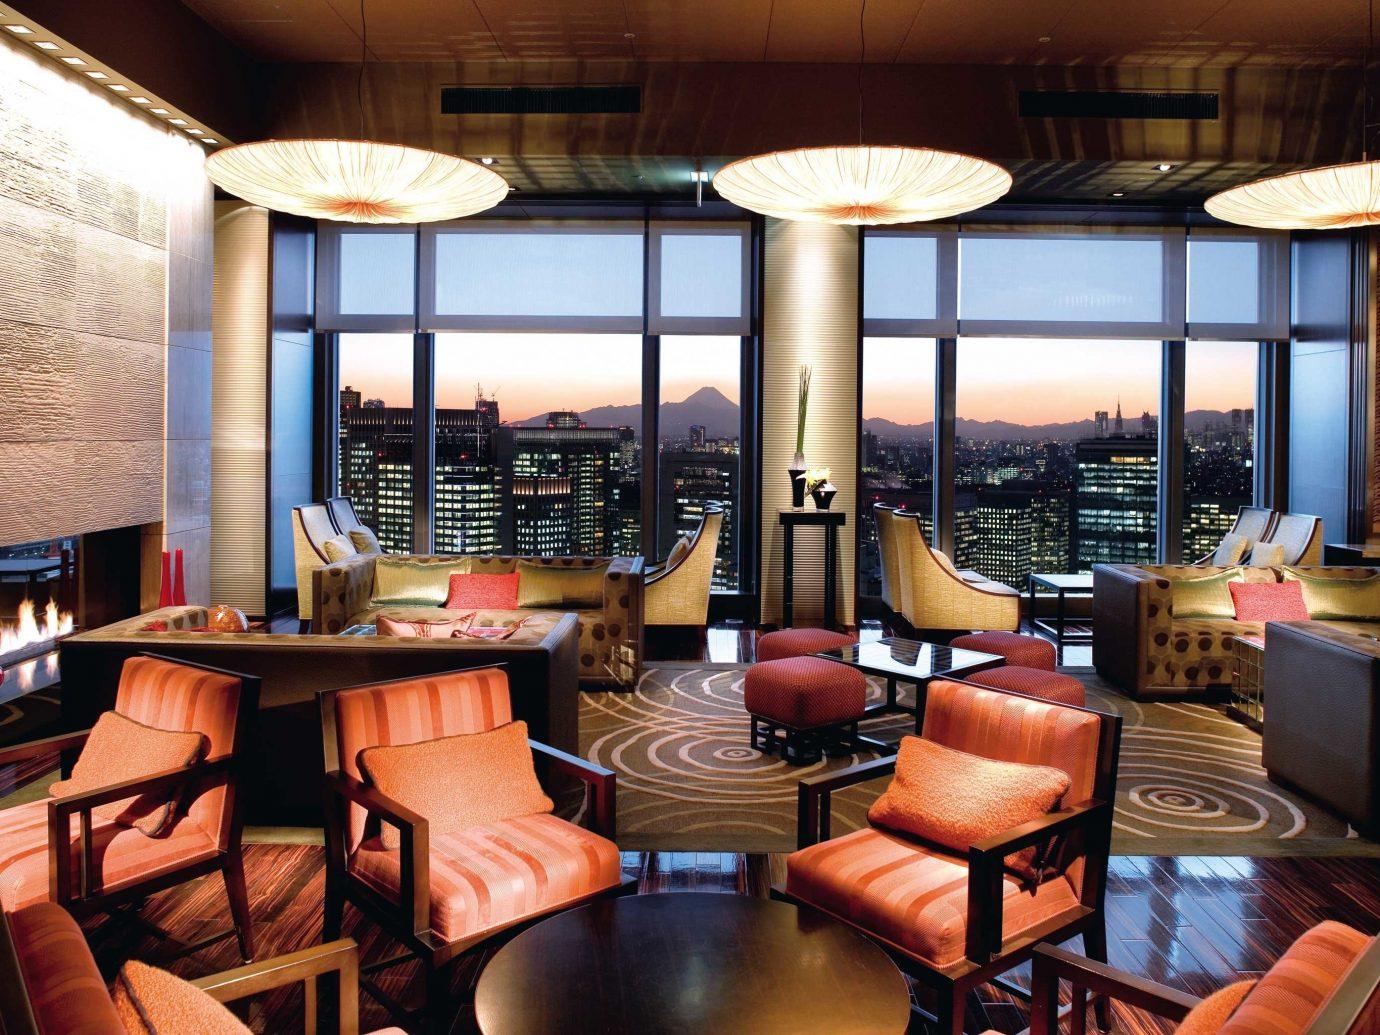 City Elegant Hotels Japan Lobby Lounge Luxury Modern Tokyo table indoor chair Living room window restaurant Resort café interior design Bar estate real estate living room furniture area leather